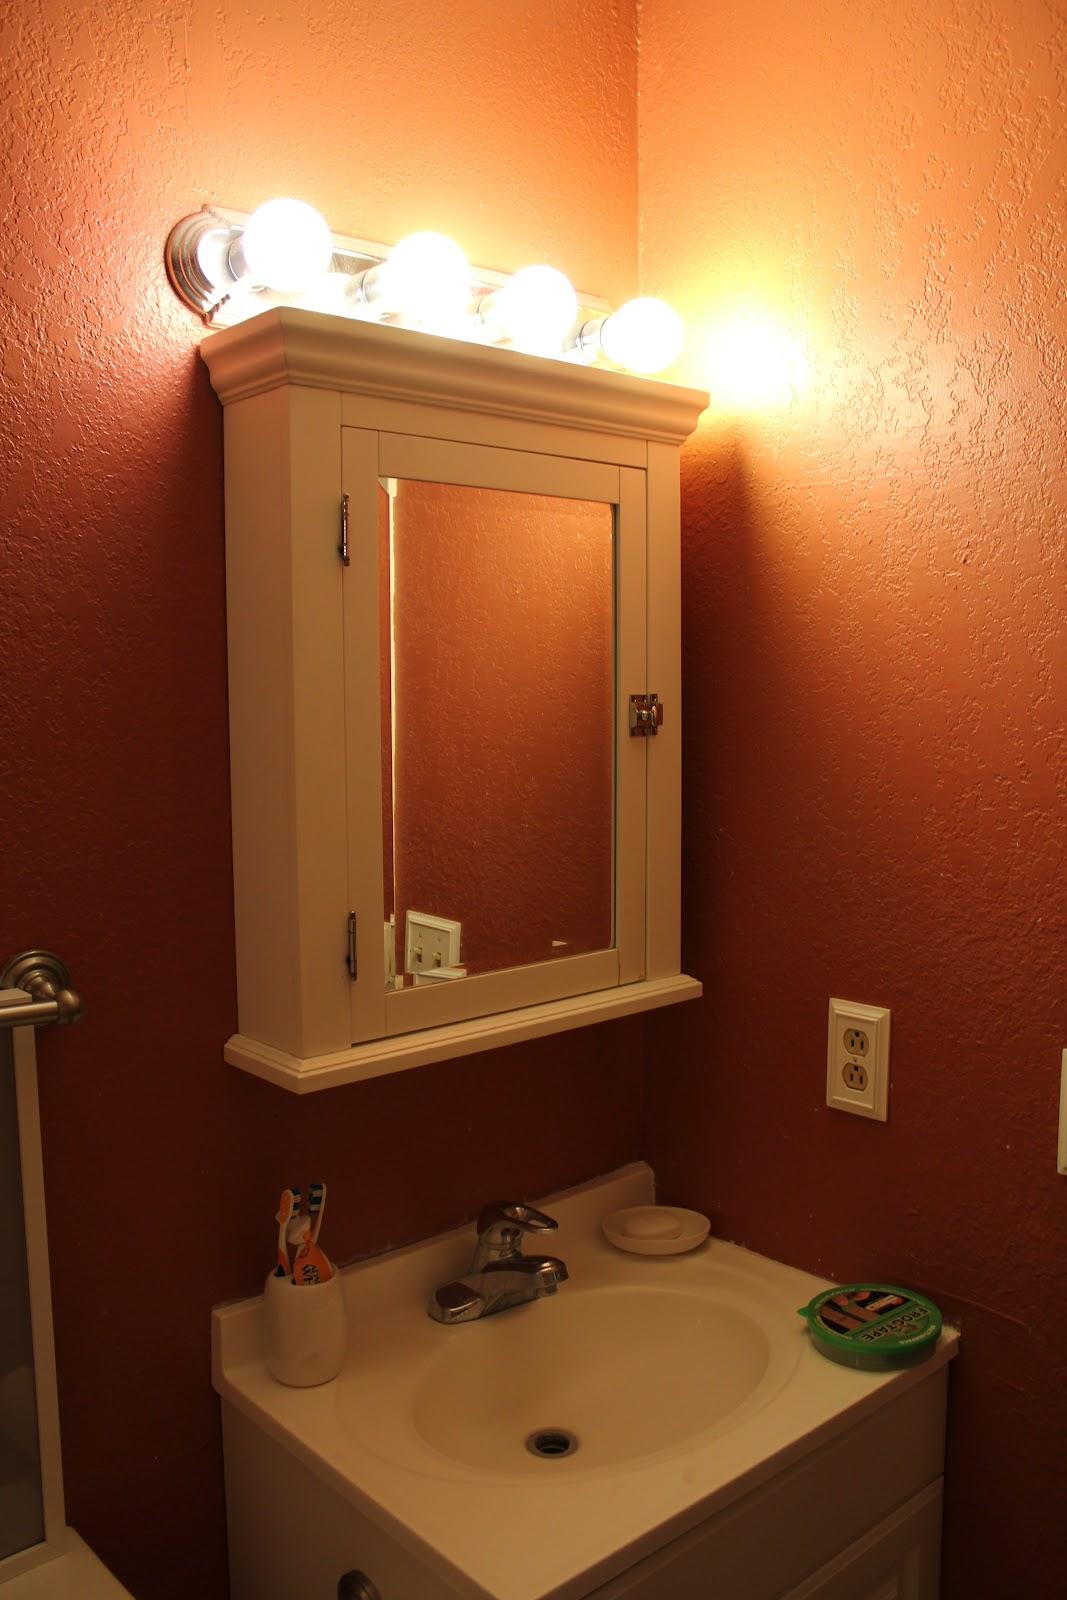 Bath Lighting Over Medicine Cabinet